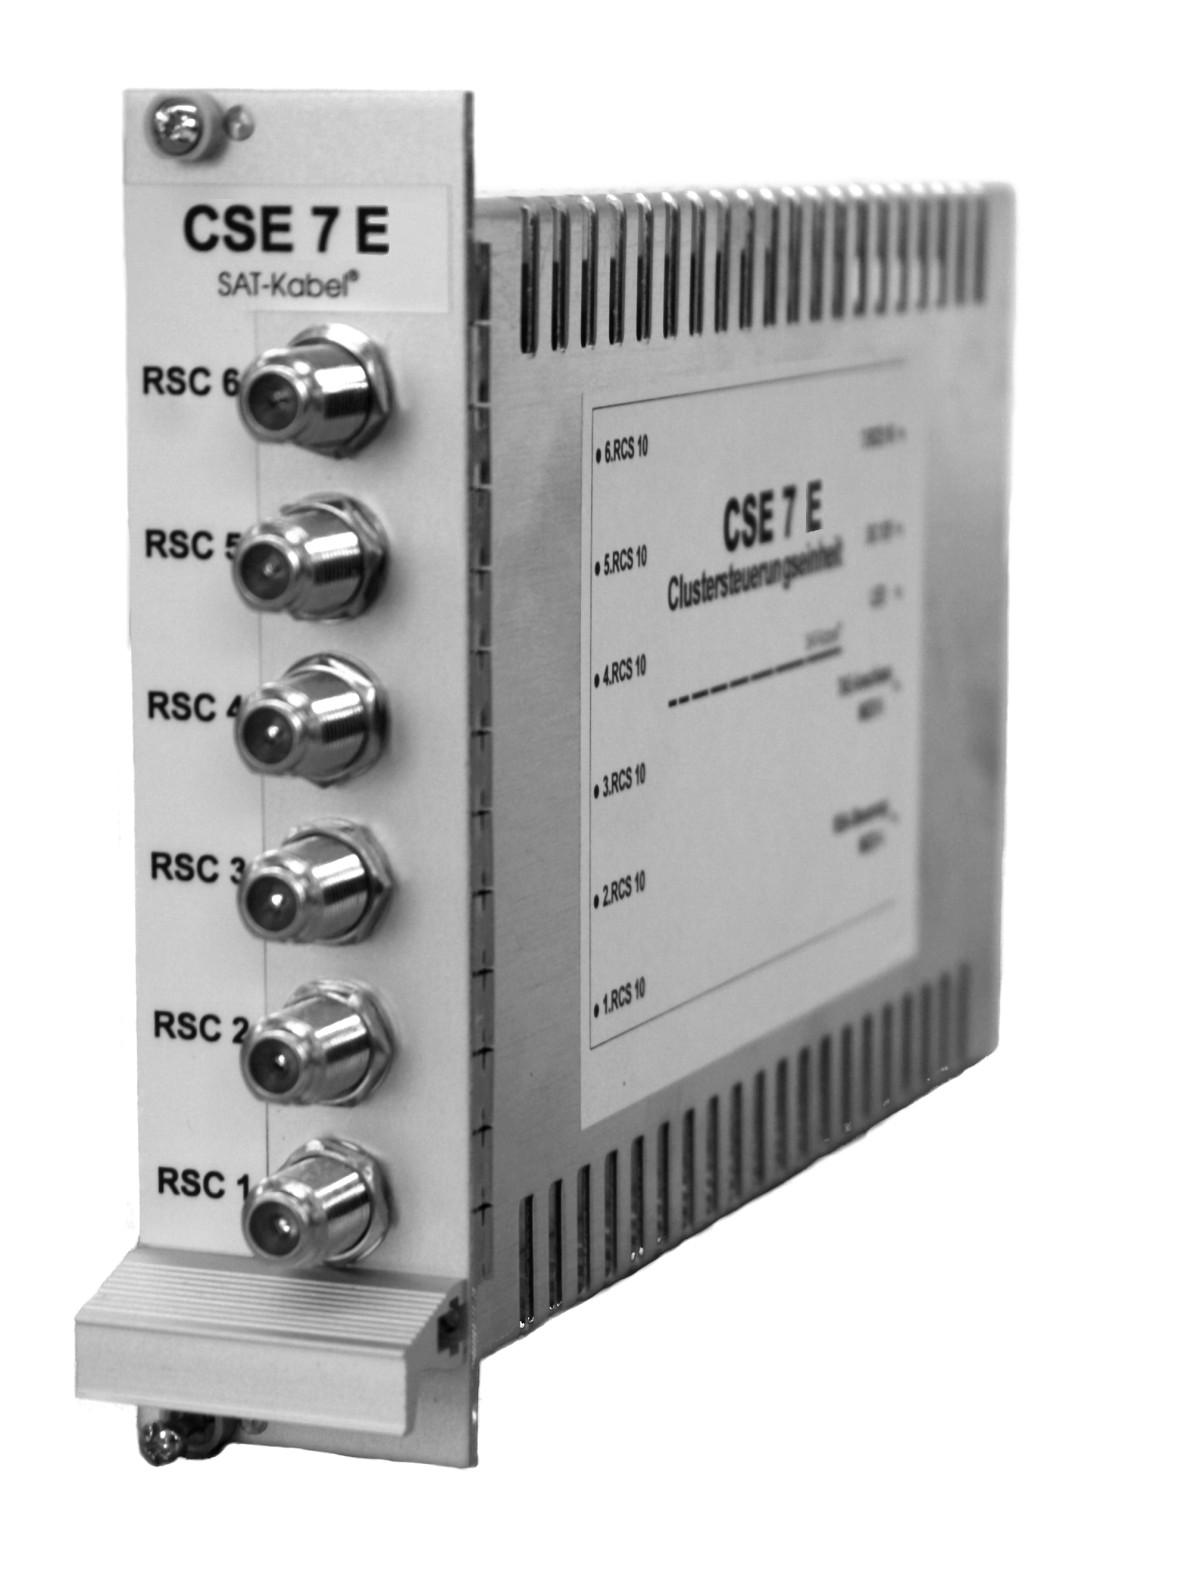 CSE 7 E - Cluster-Steuereinheit